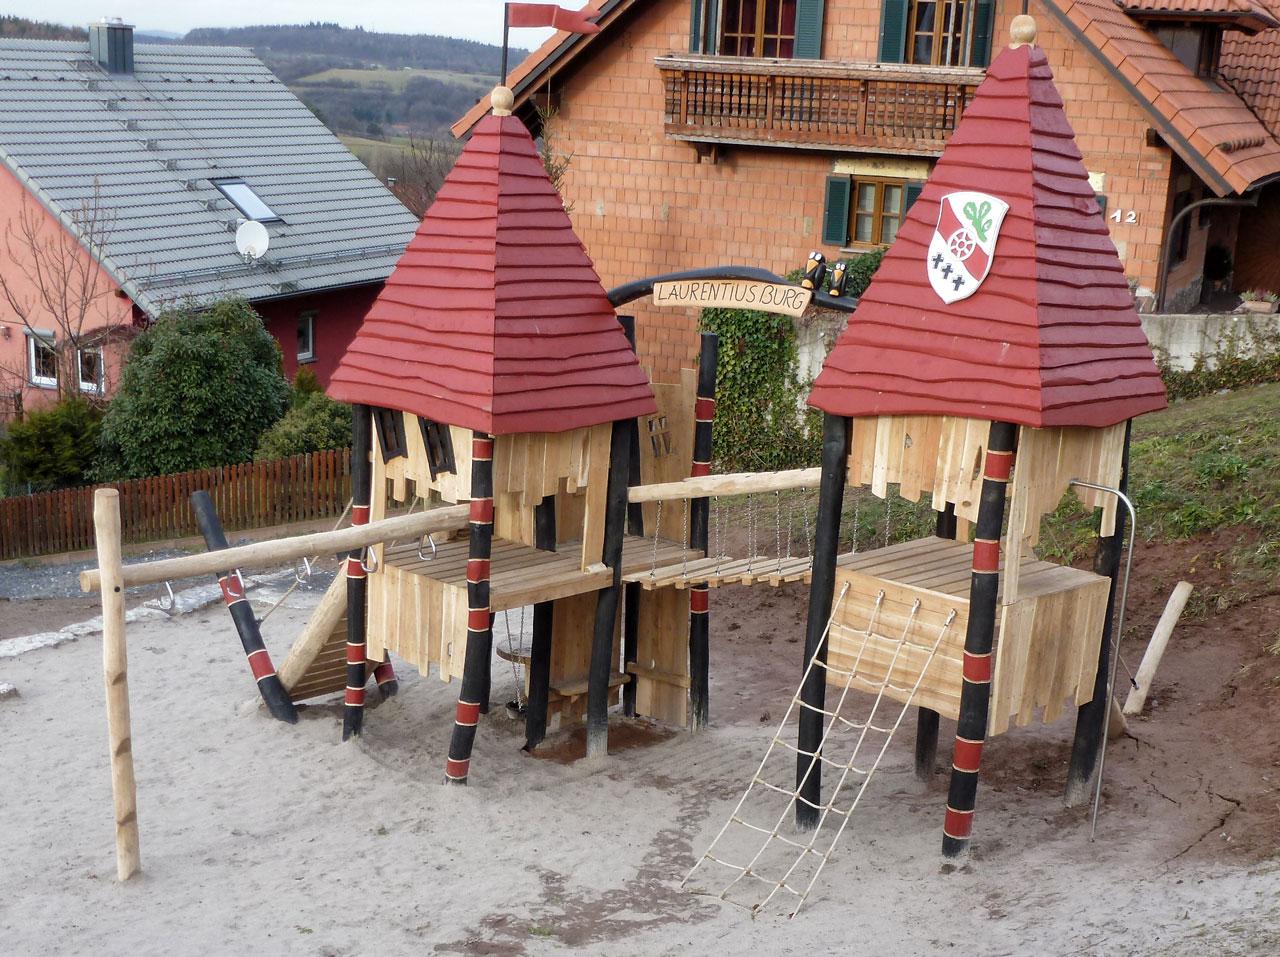 T 42 Spielplatz Laurentiusburg